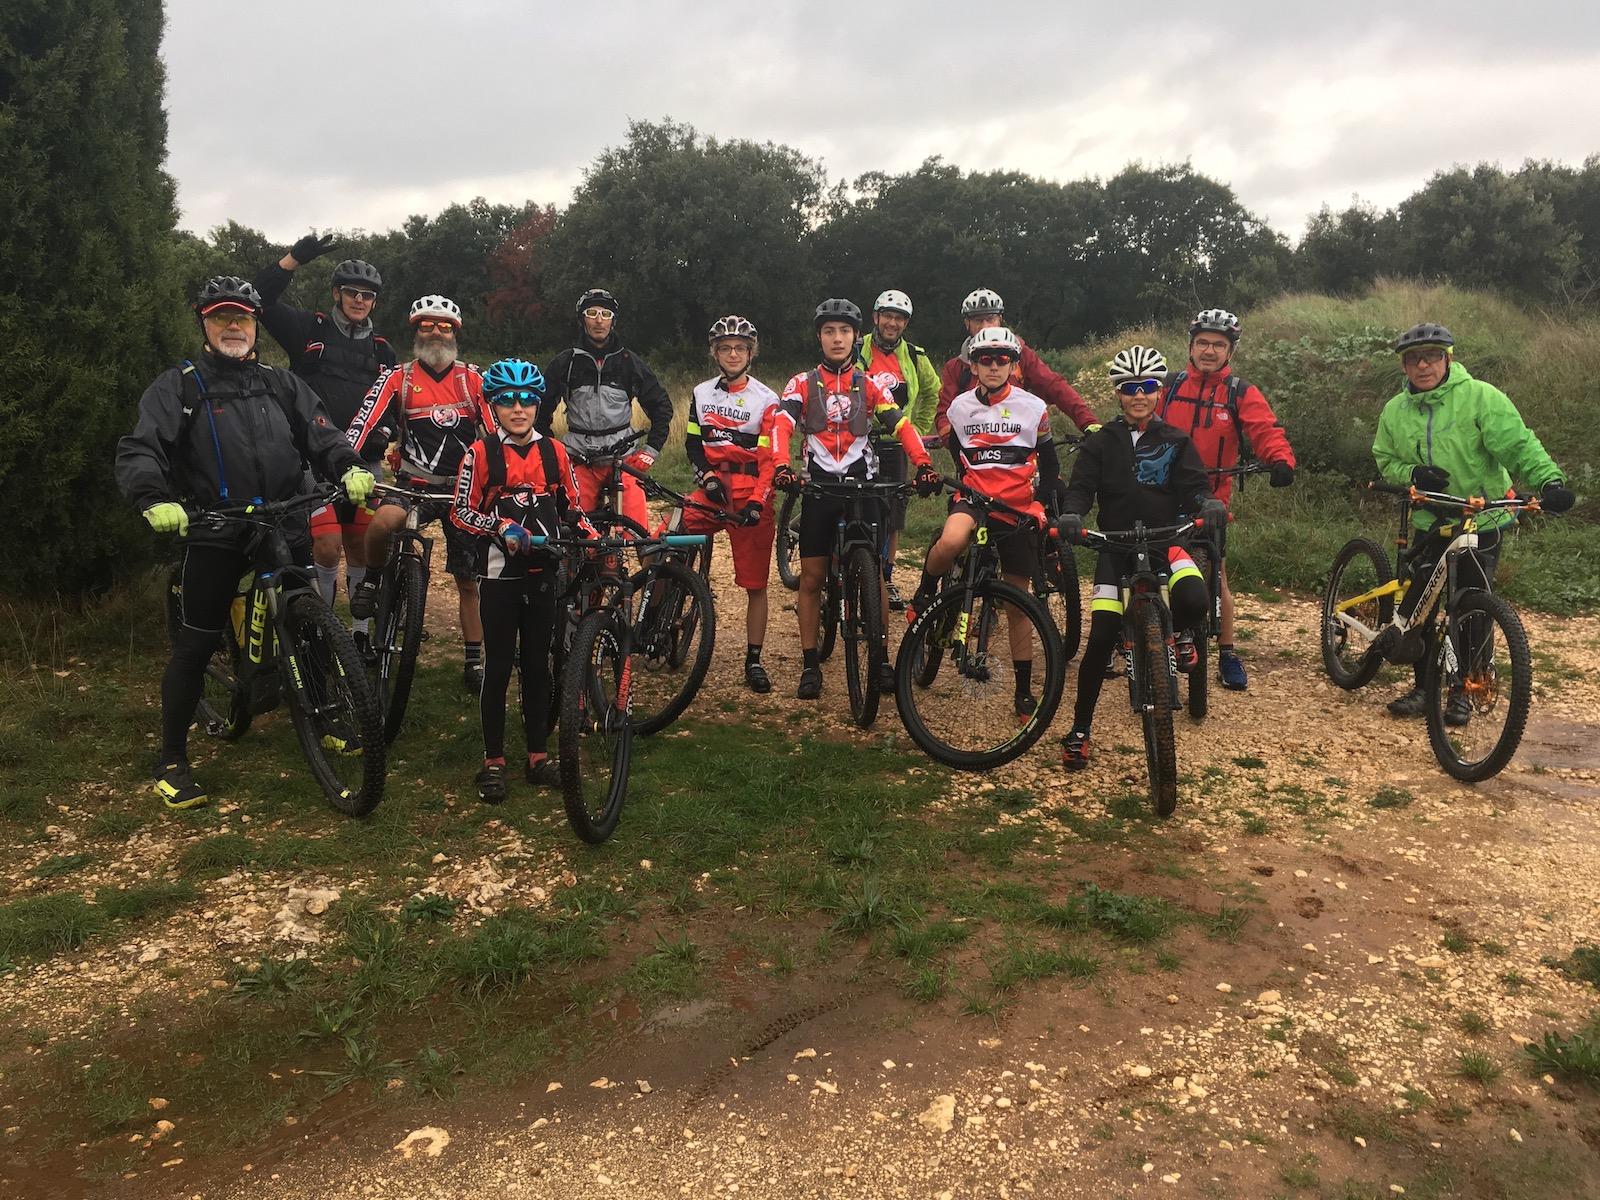 Reco boucle 20 km de la rando 55 de la Vttruffes 2019